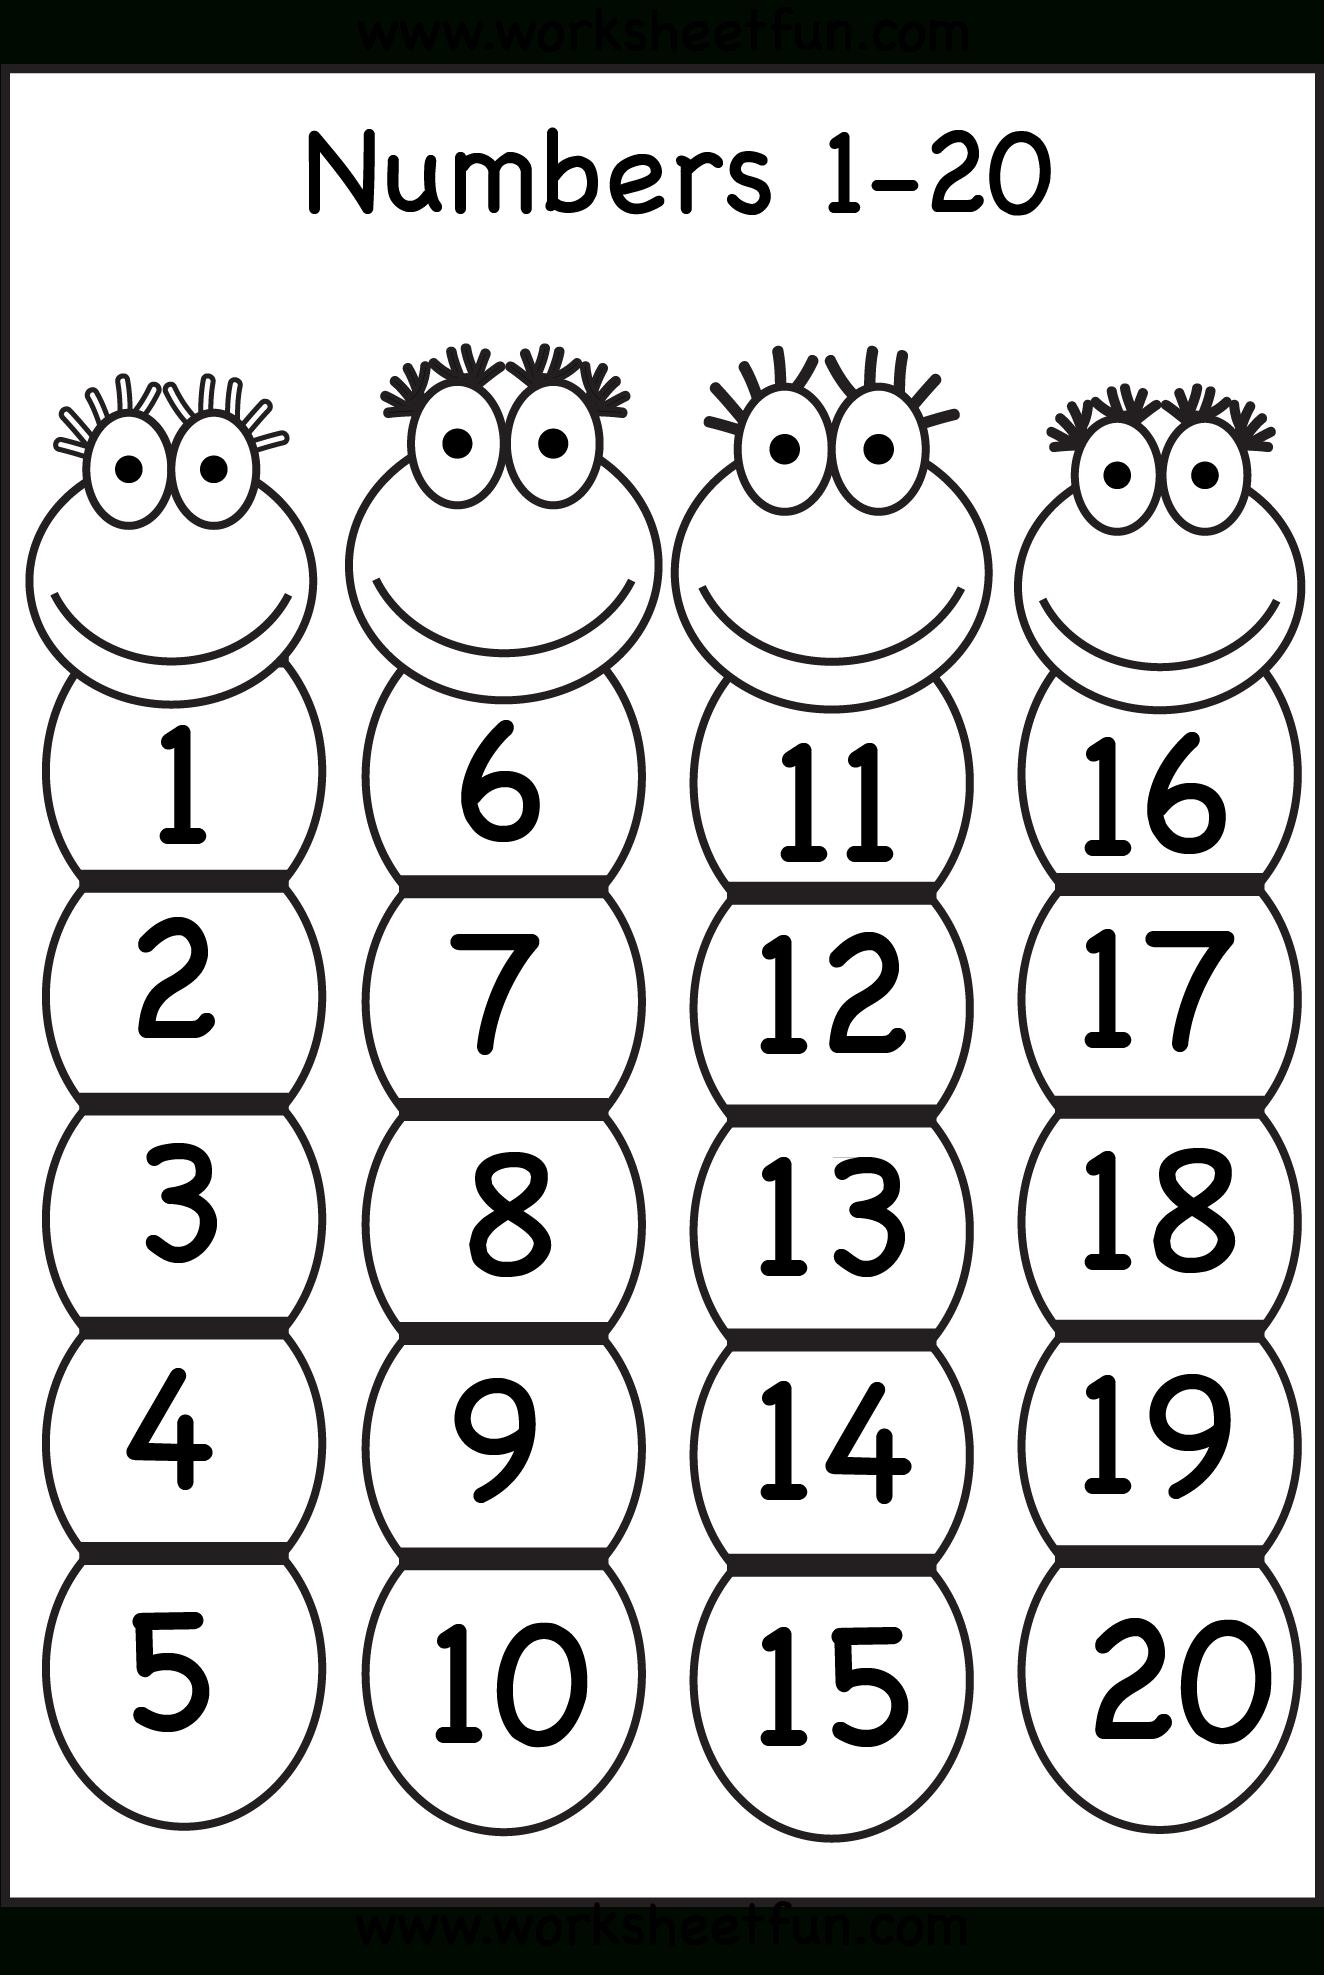 Number Chart 1-20 | Numbers Preschool, Preschool Number